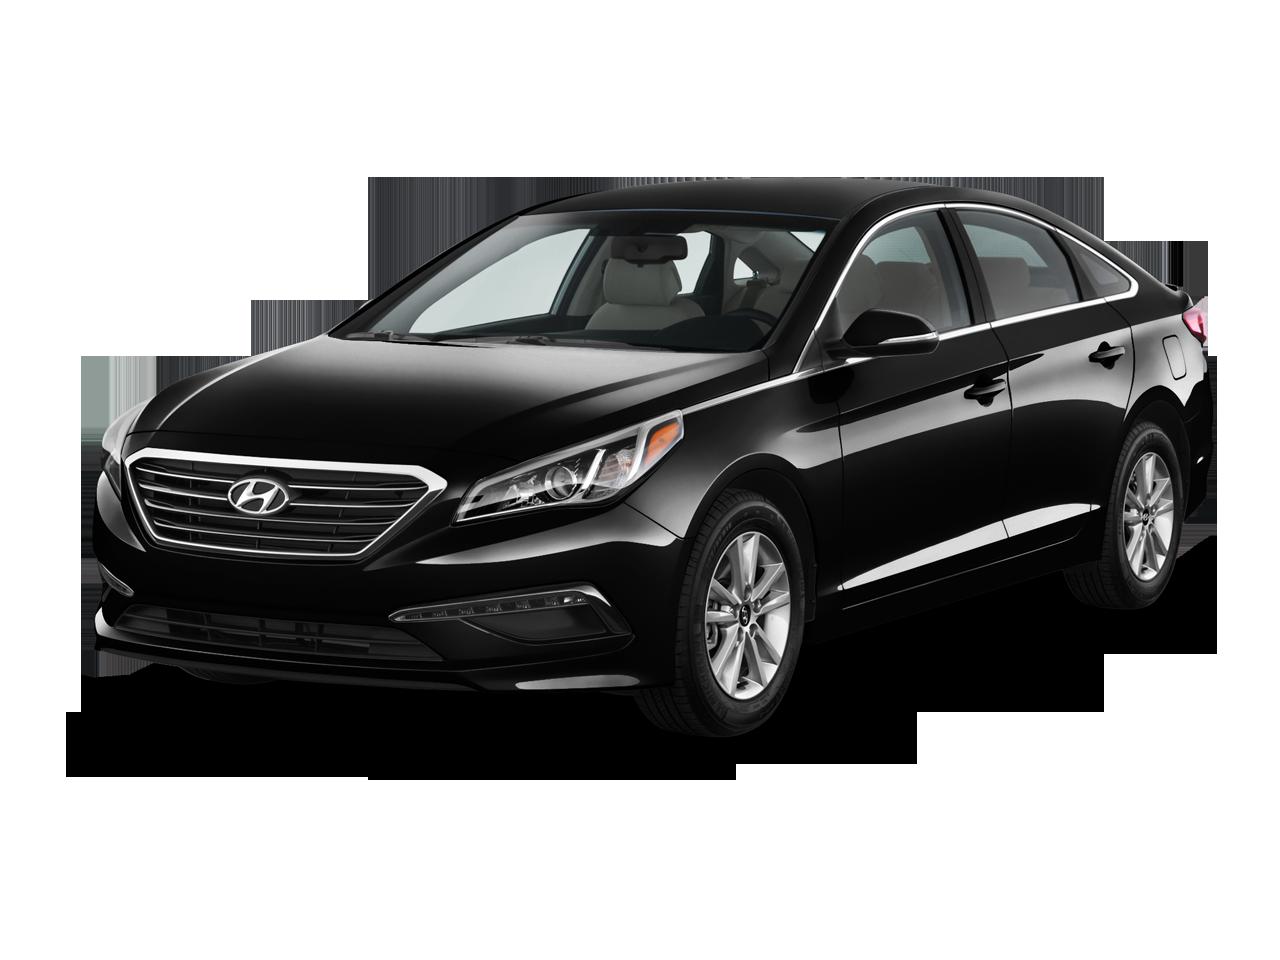 Hyundai dealer incentives pohanka hyundai of capitol heights for Lee hyundai motor finance